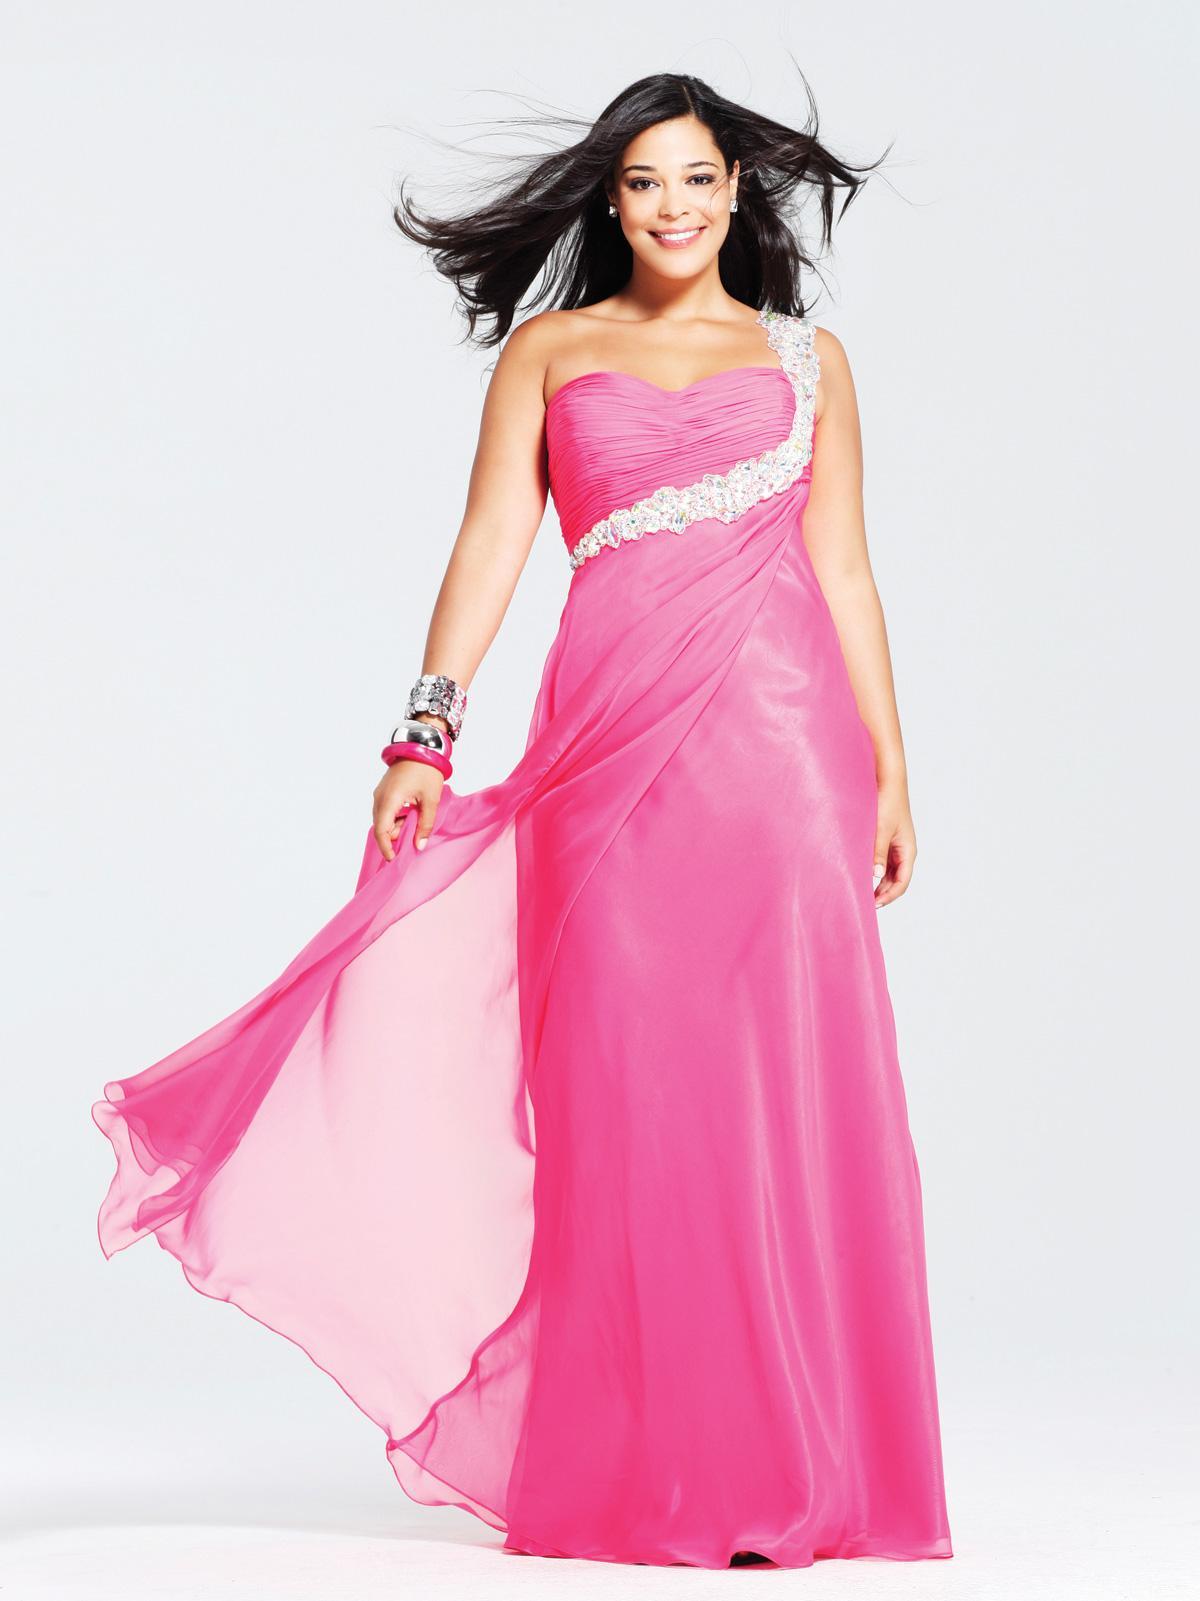 841b8ba2ff6f Fotos de vestidos de fiesta talla plus - Paperblog